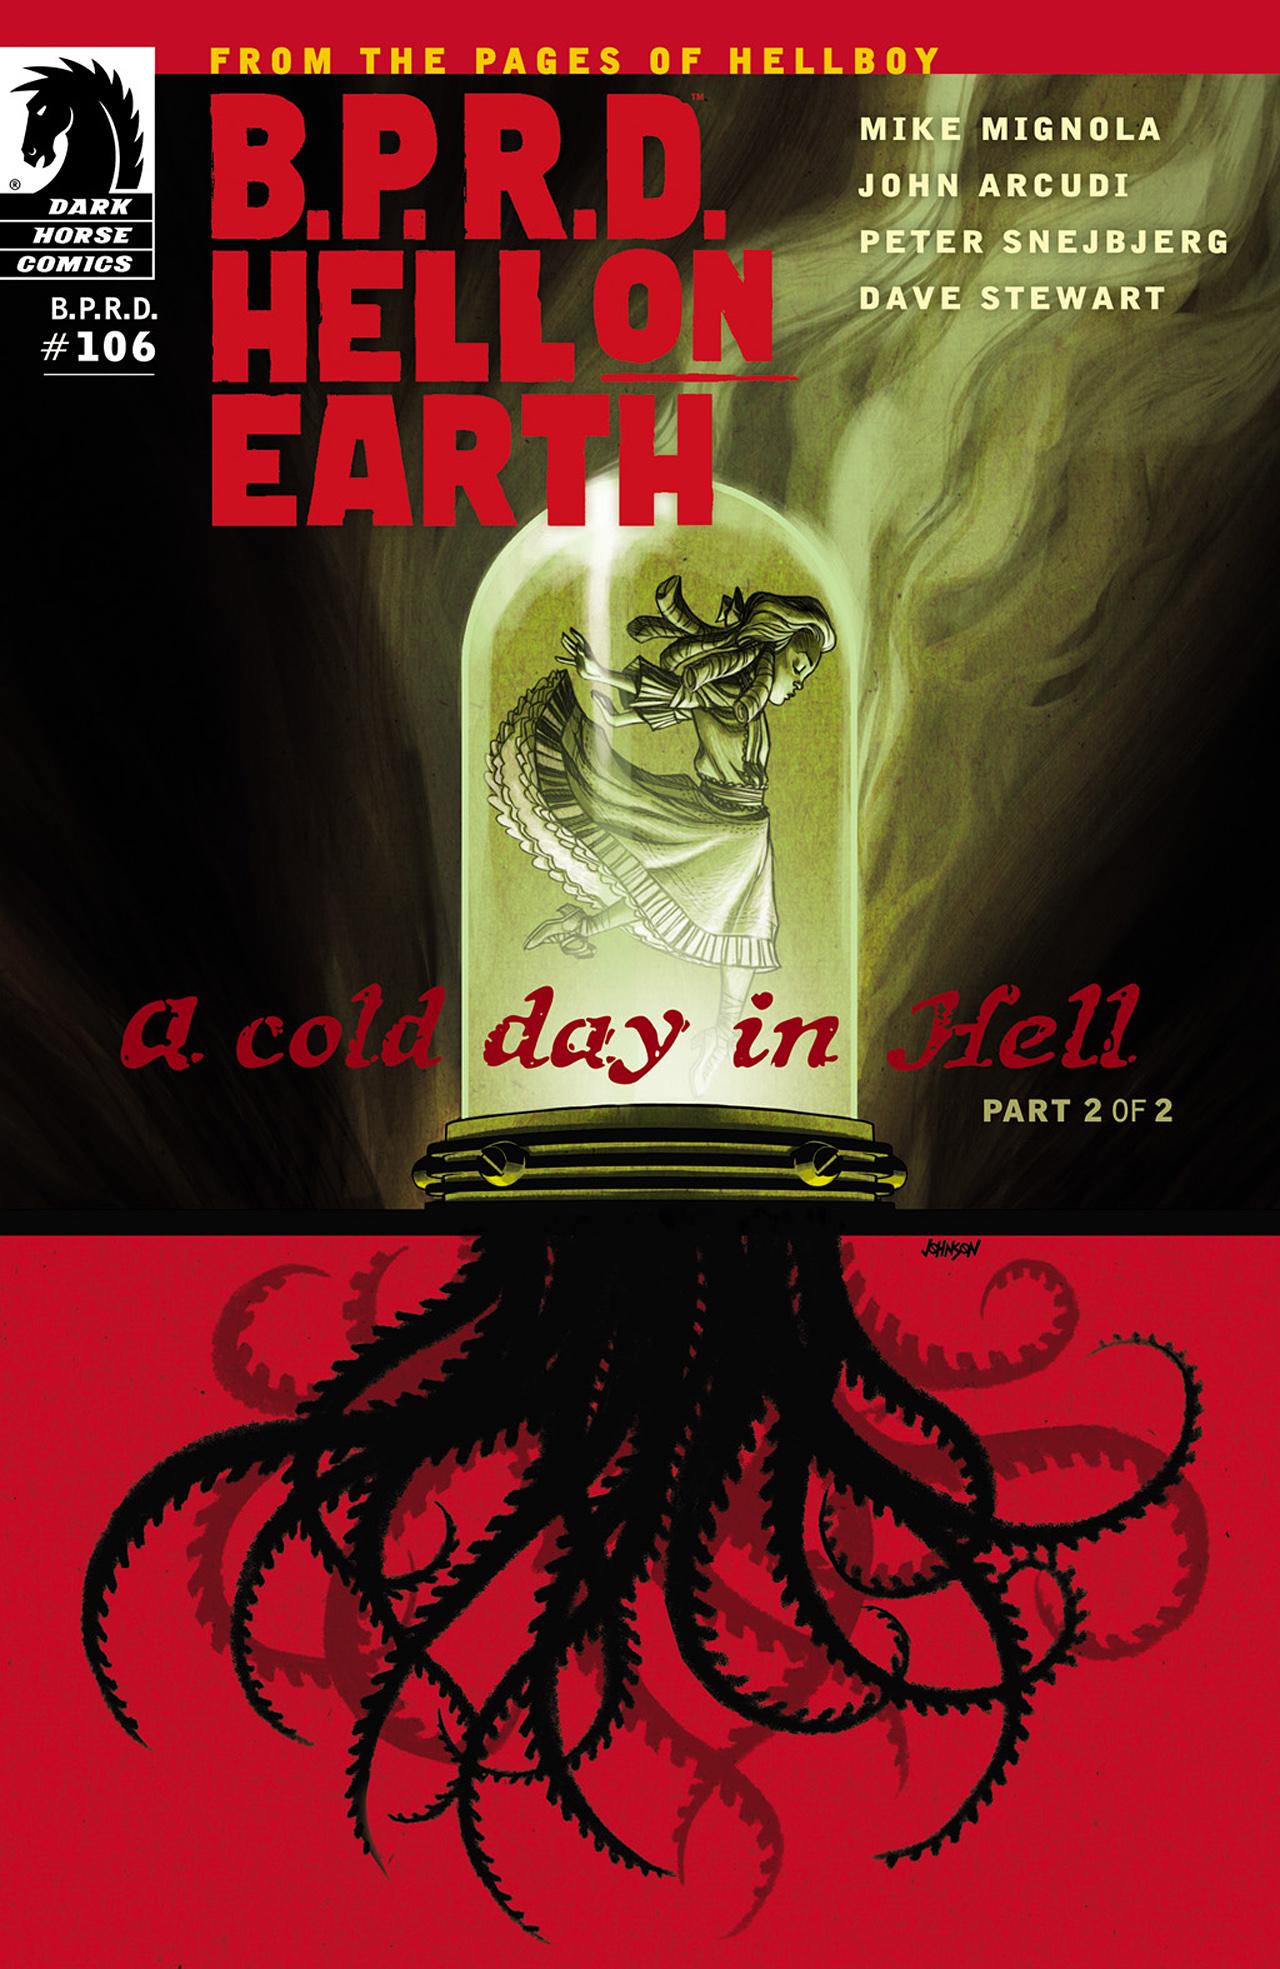 B.P.R.D. Hell on Earth: A Cold Day in Hell issue 106 - Page 1